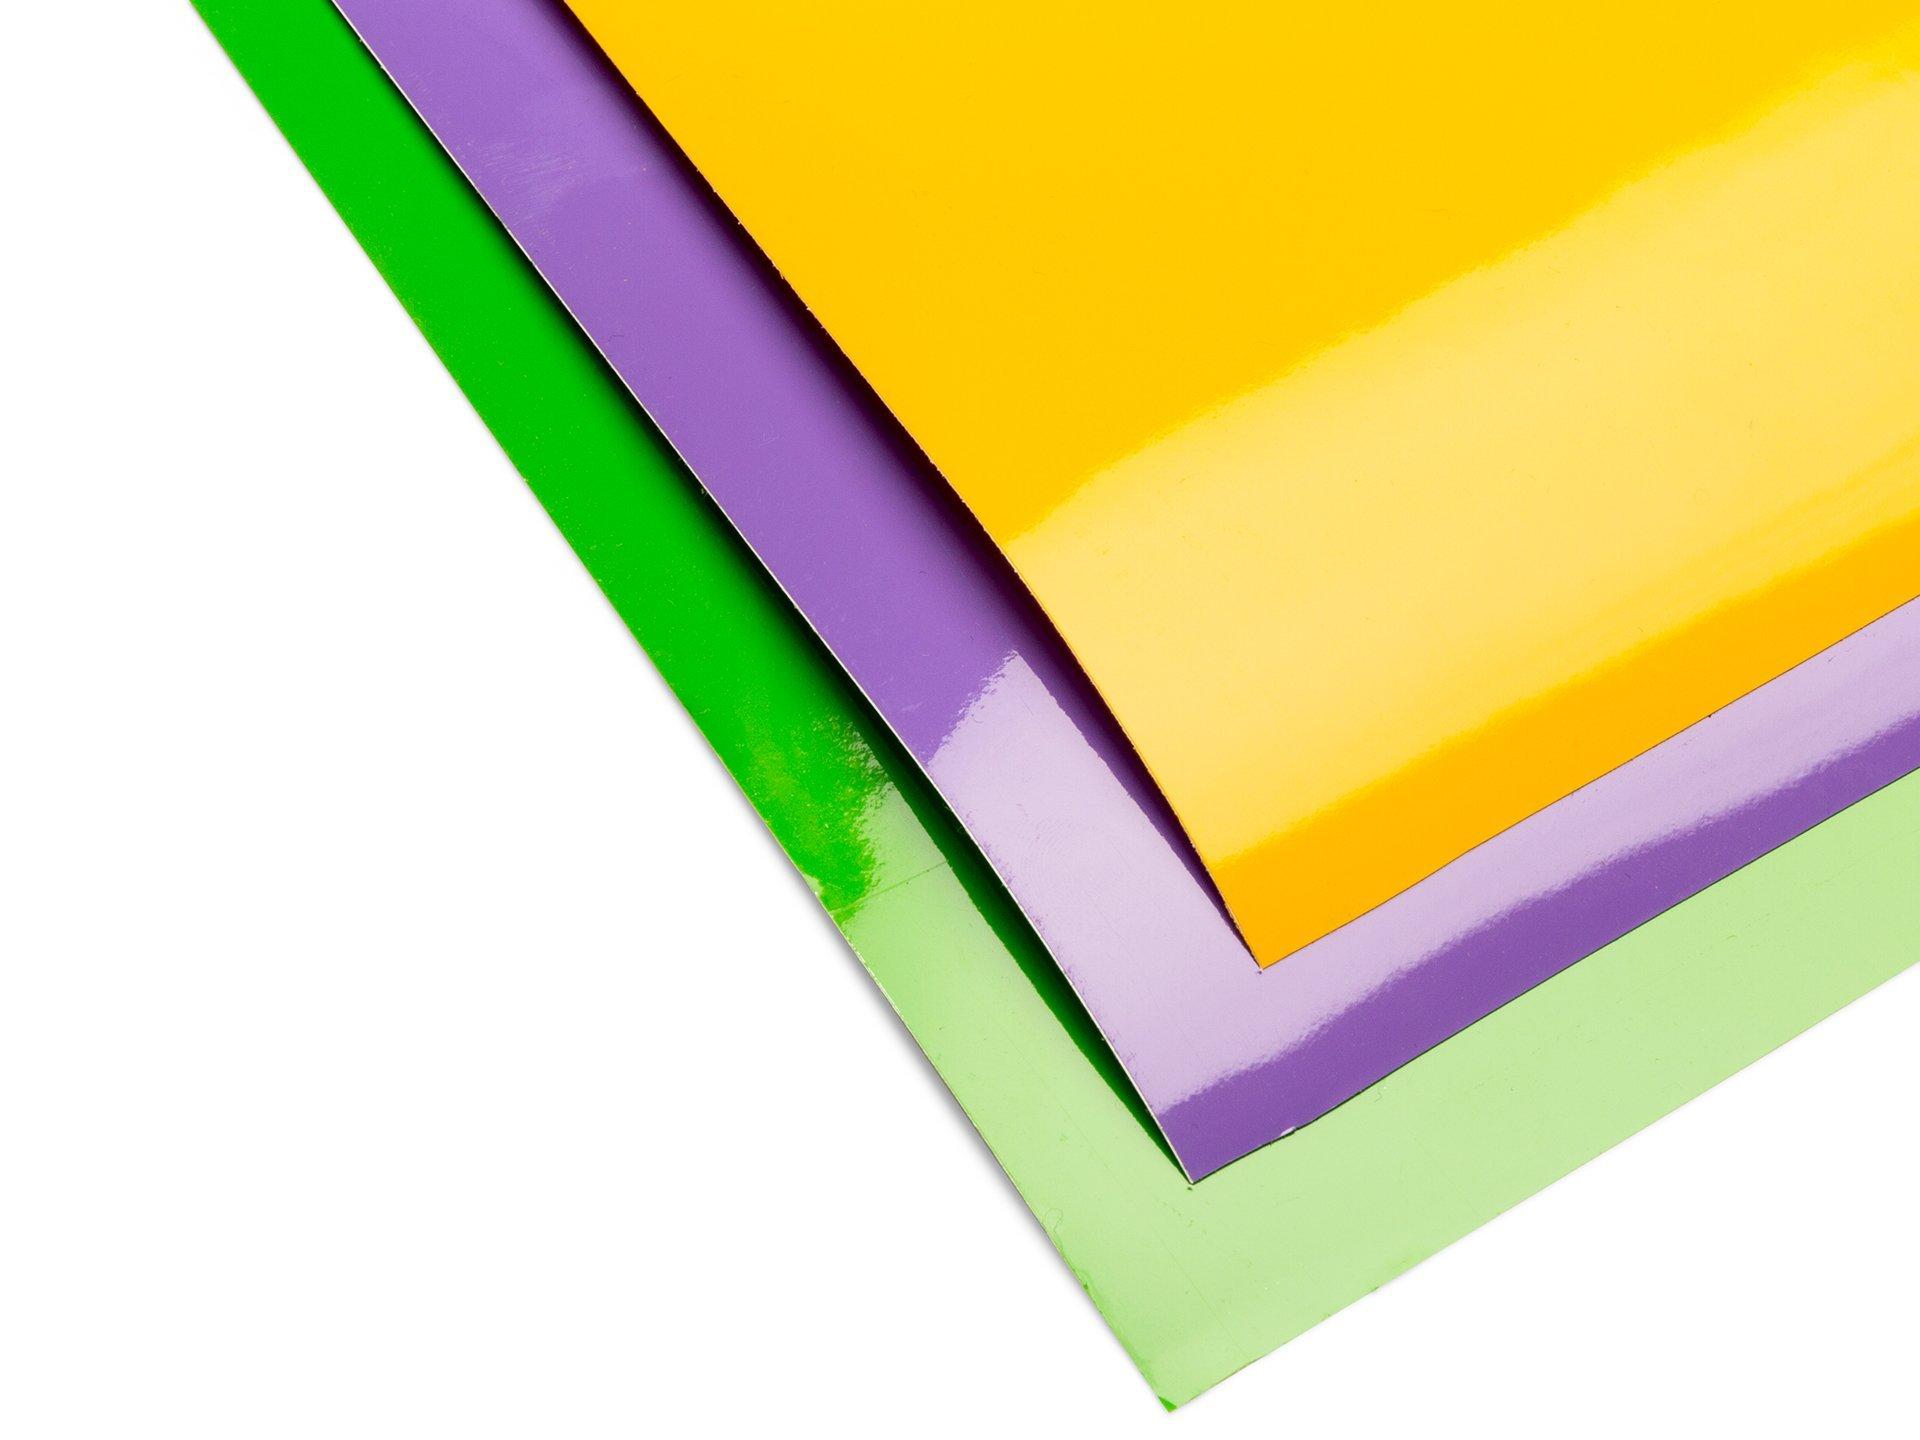 Oracal 651 farbklebefolie opak gl nzend kaufen modulor for Farbige klebefolien